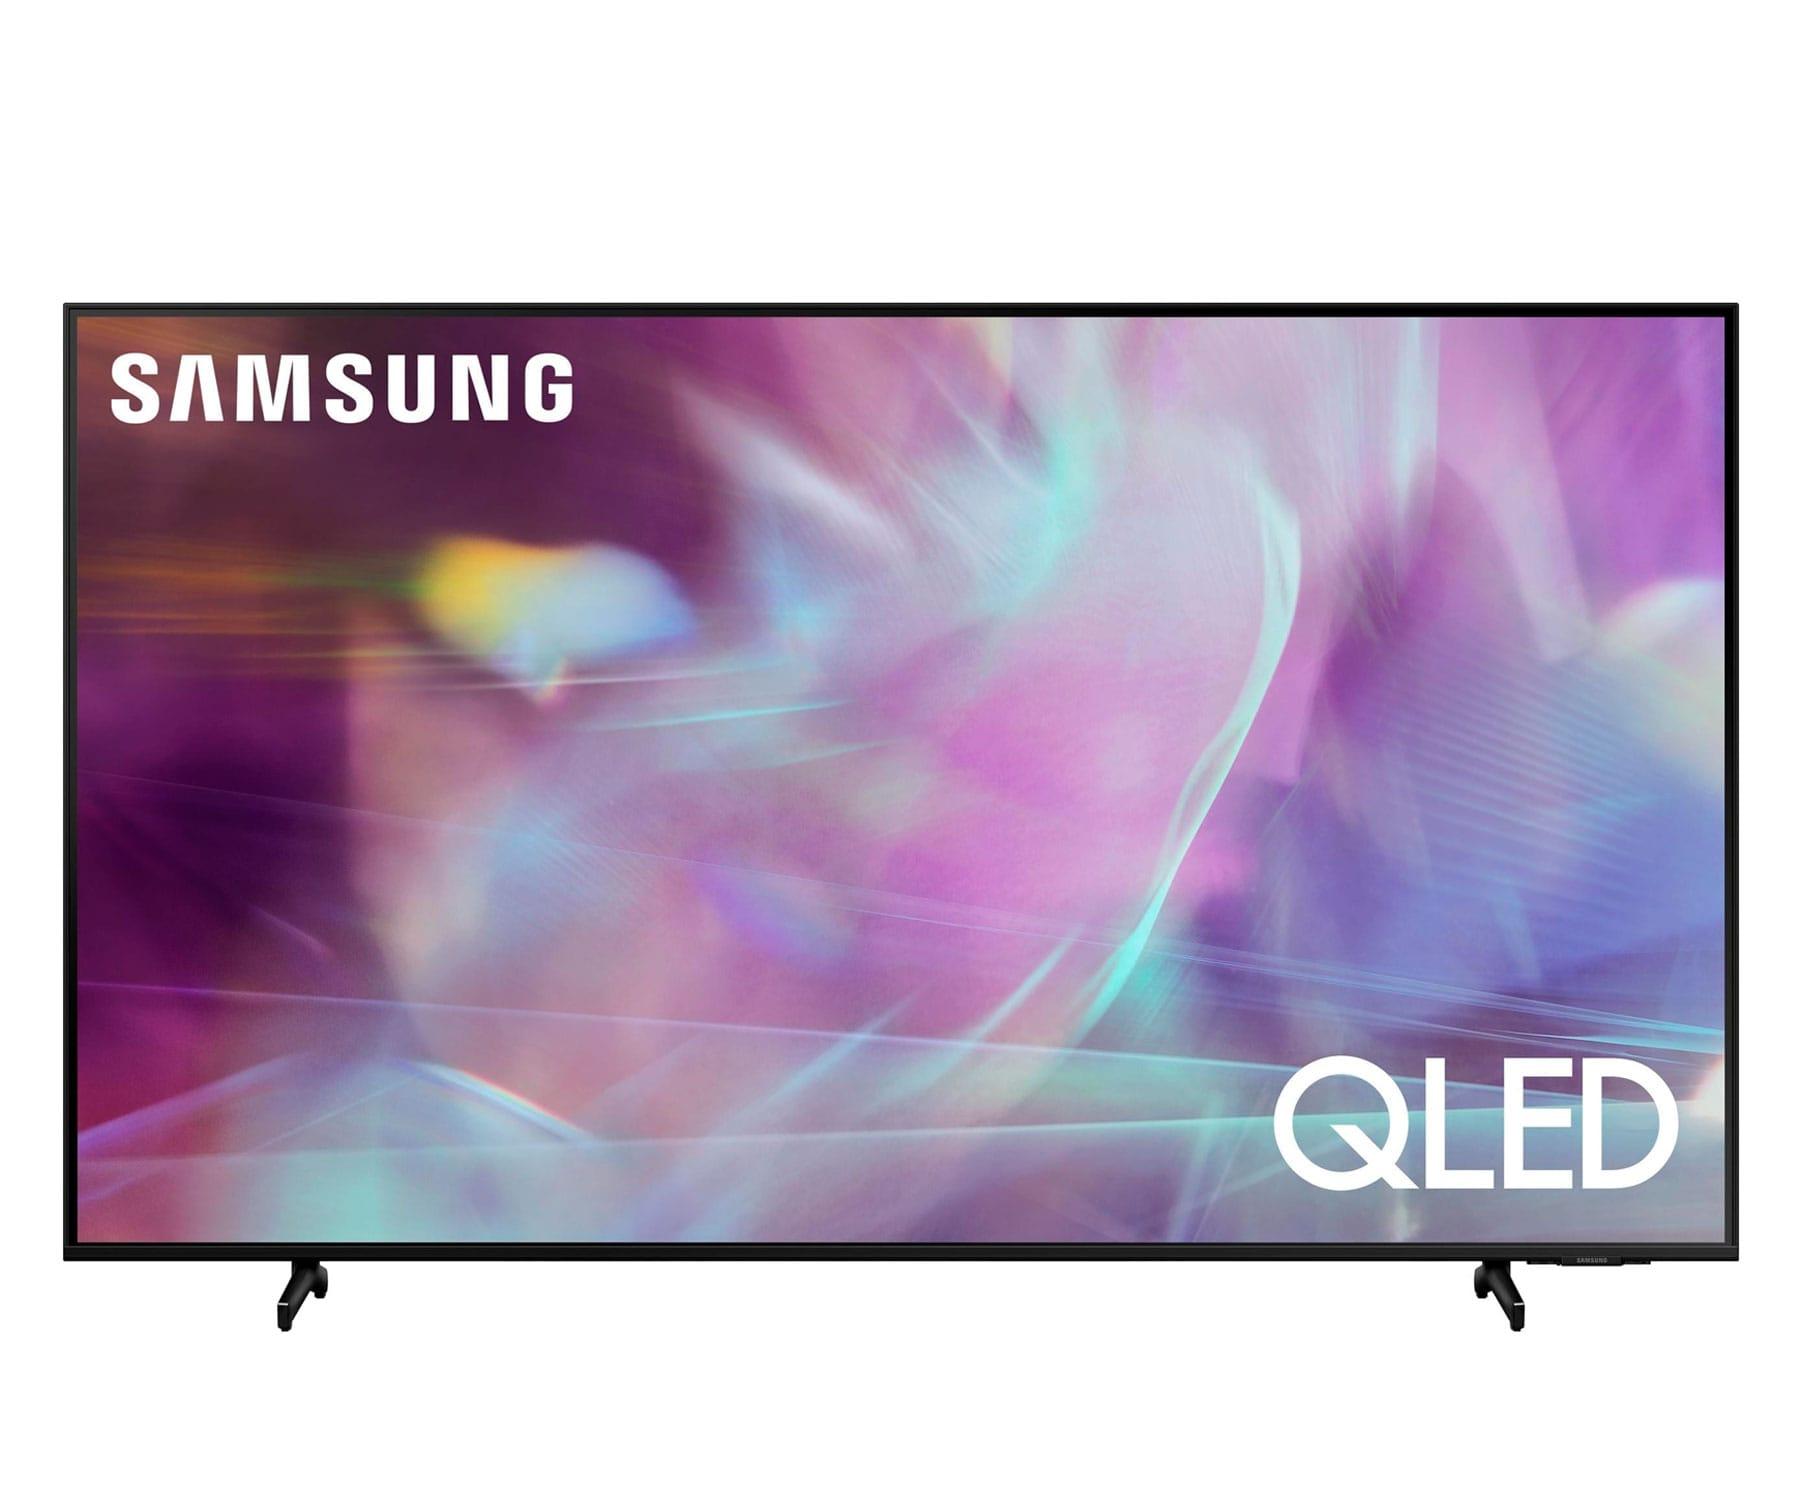 SAMSUNG QE43Q60AAUXXC NEGRO TELEVISOR 43'' QLED 4K SMART TV WIFI BLUETOOTH AMBIENT MODE